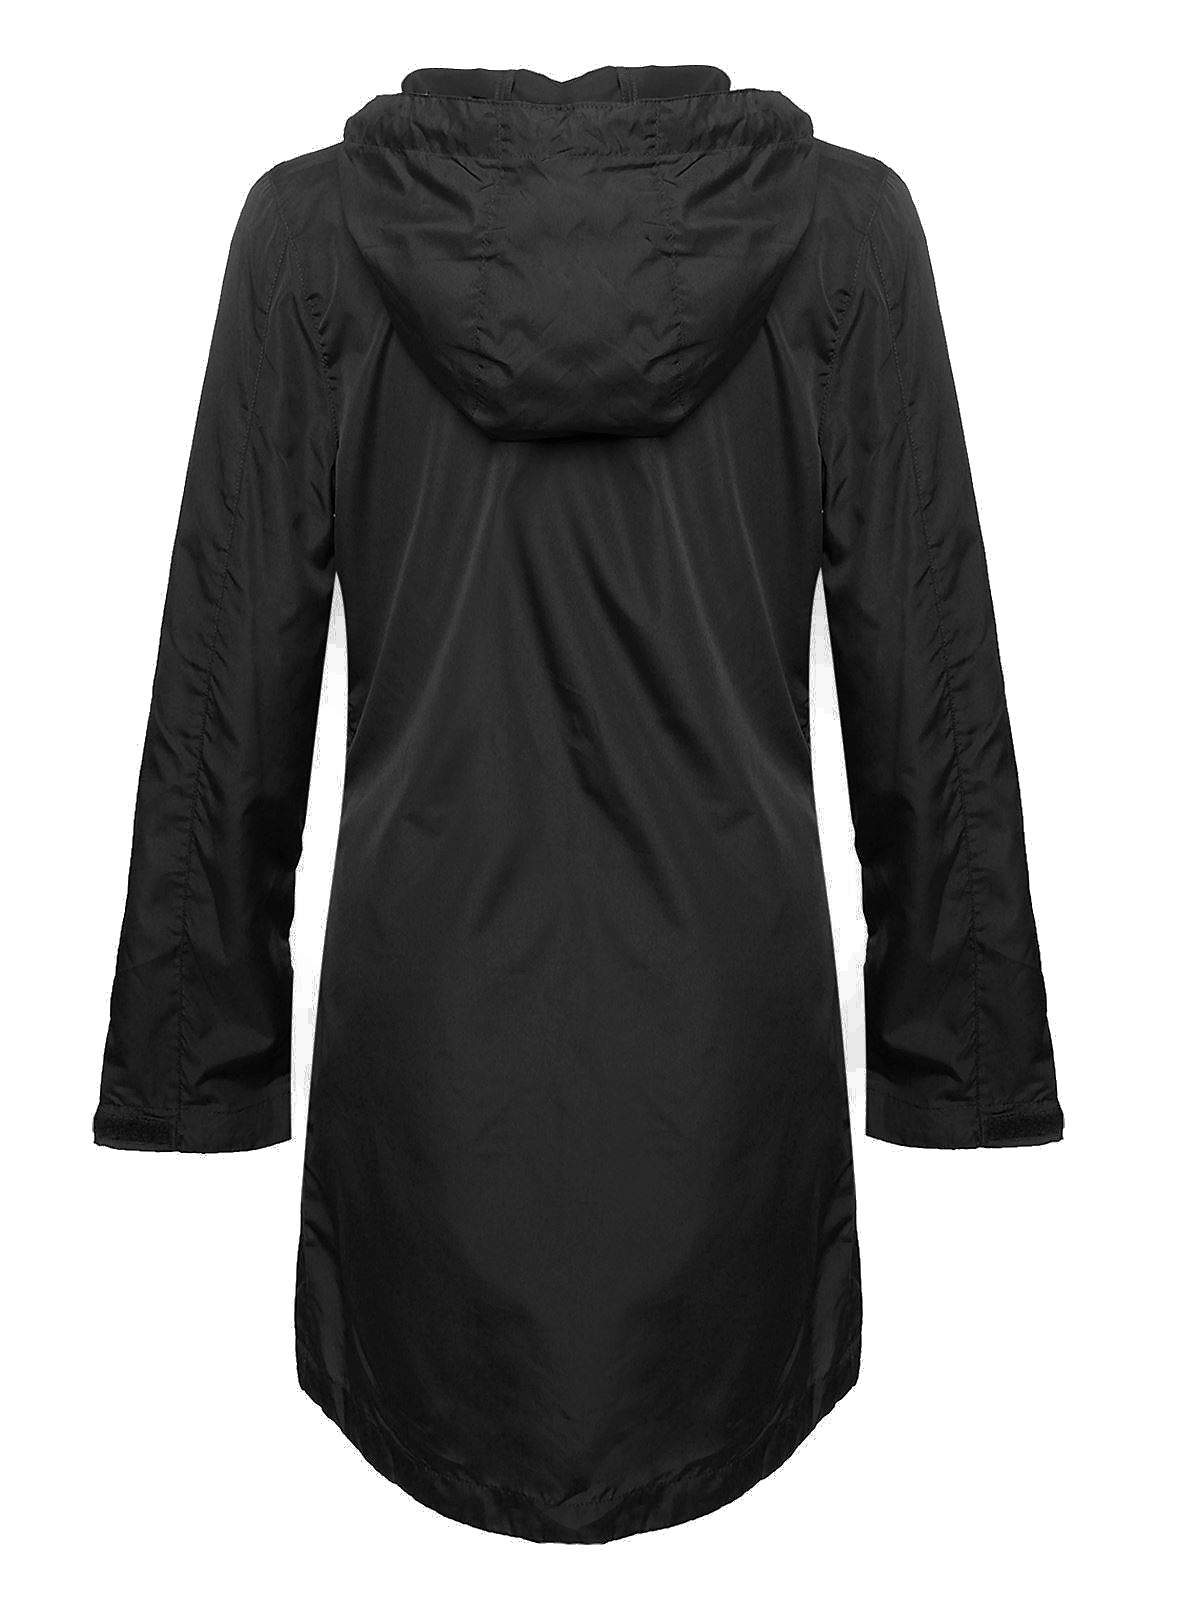 New-Ladies-Womens-Showerproof-Mac-Light-Rain-Jacket-Plus-Sizes thumbnail 3